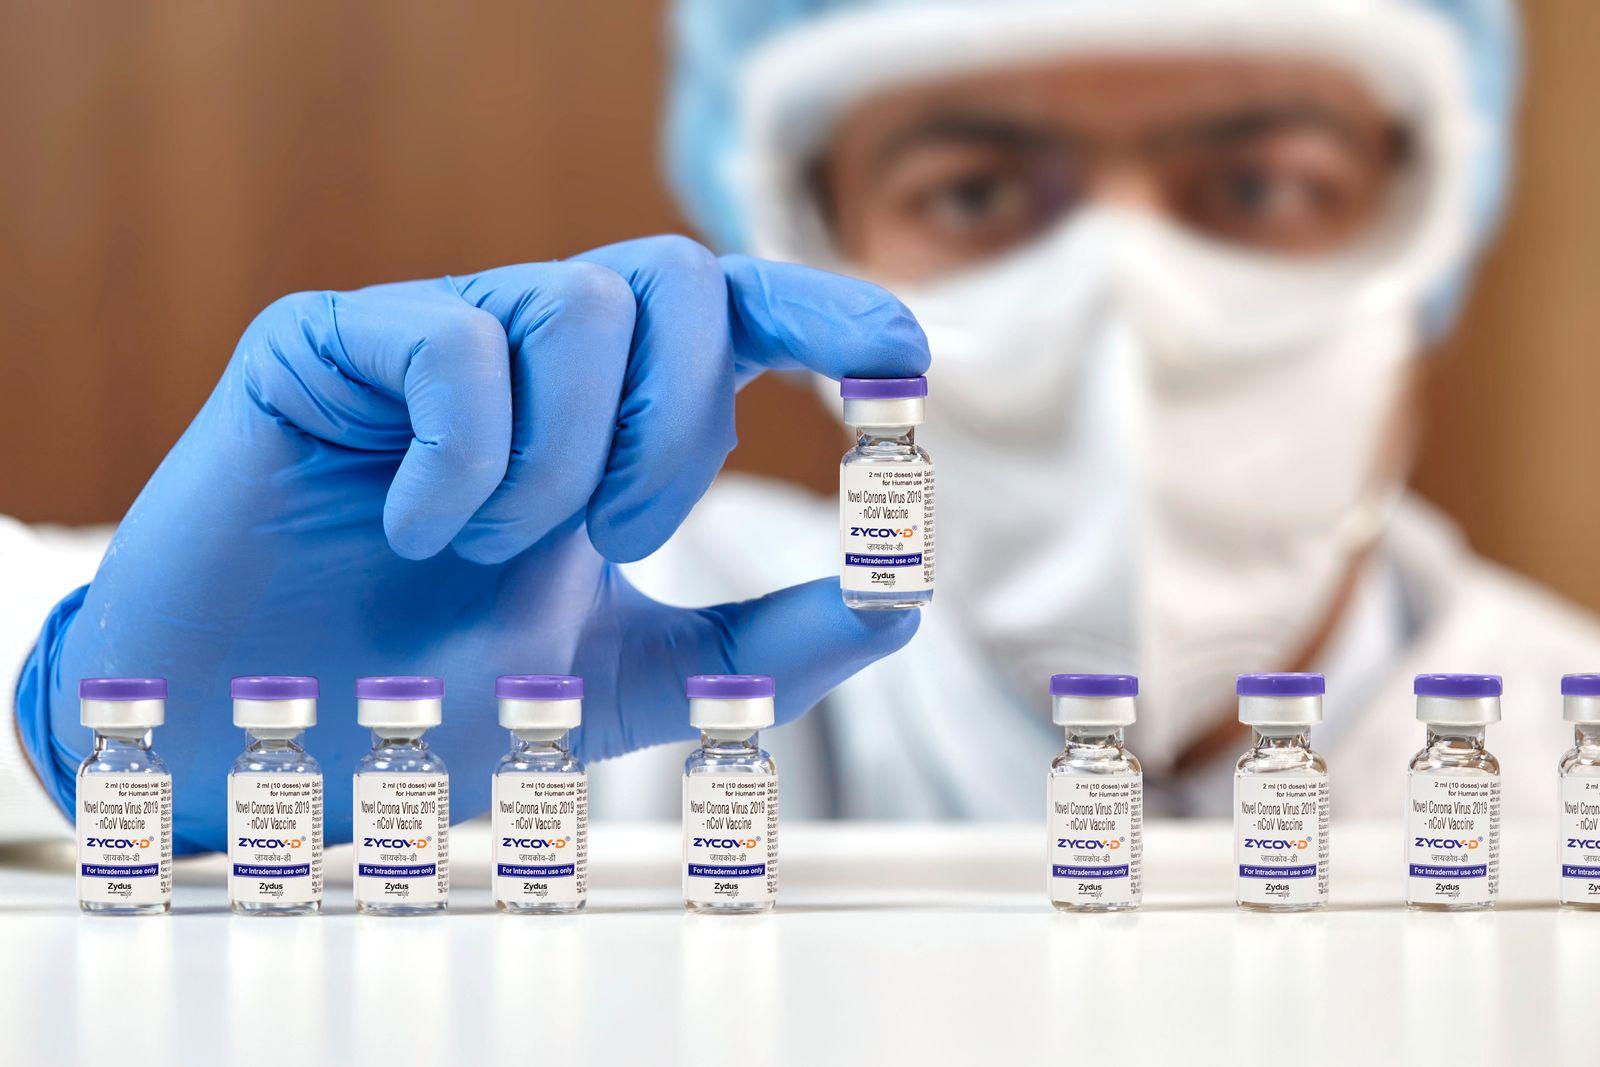 Corona Impfung ZyCoV-D